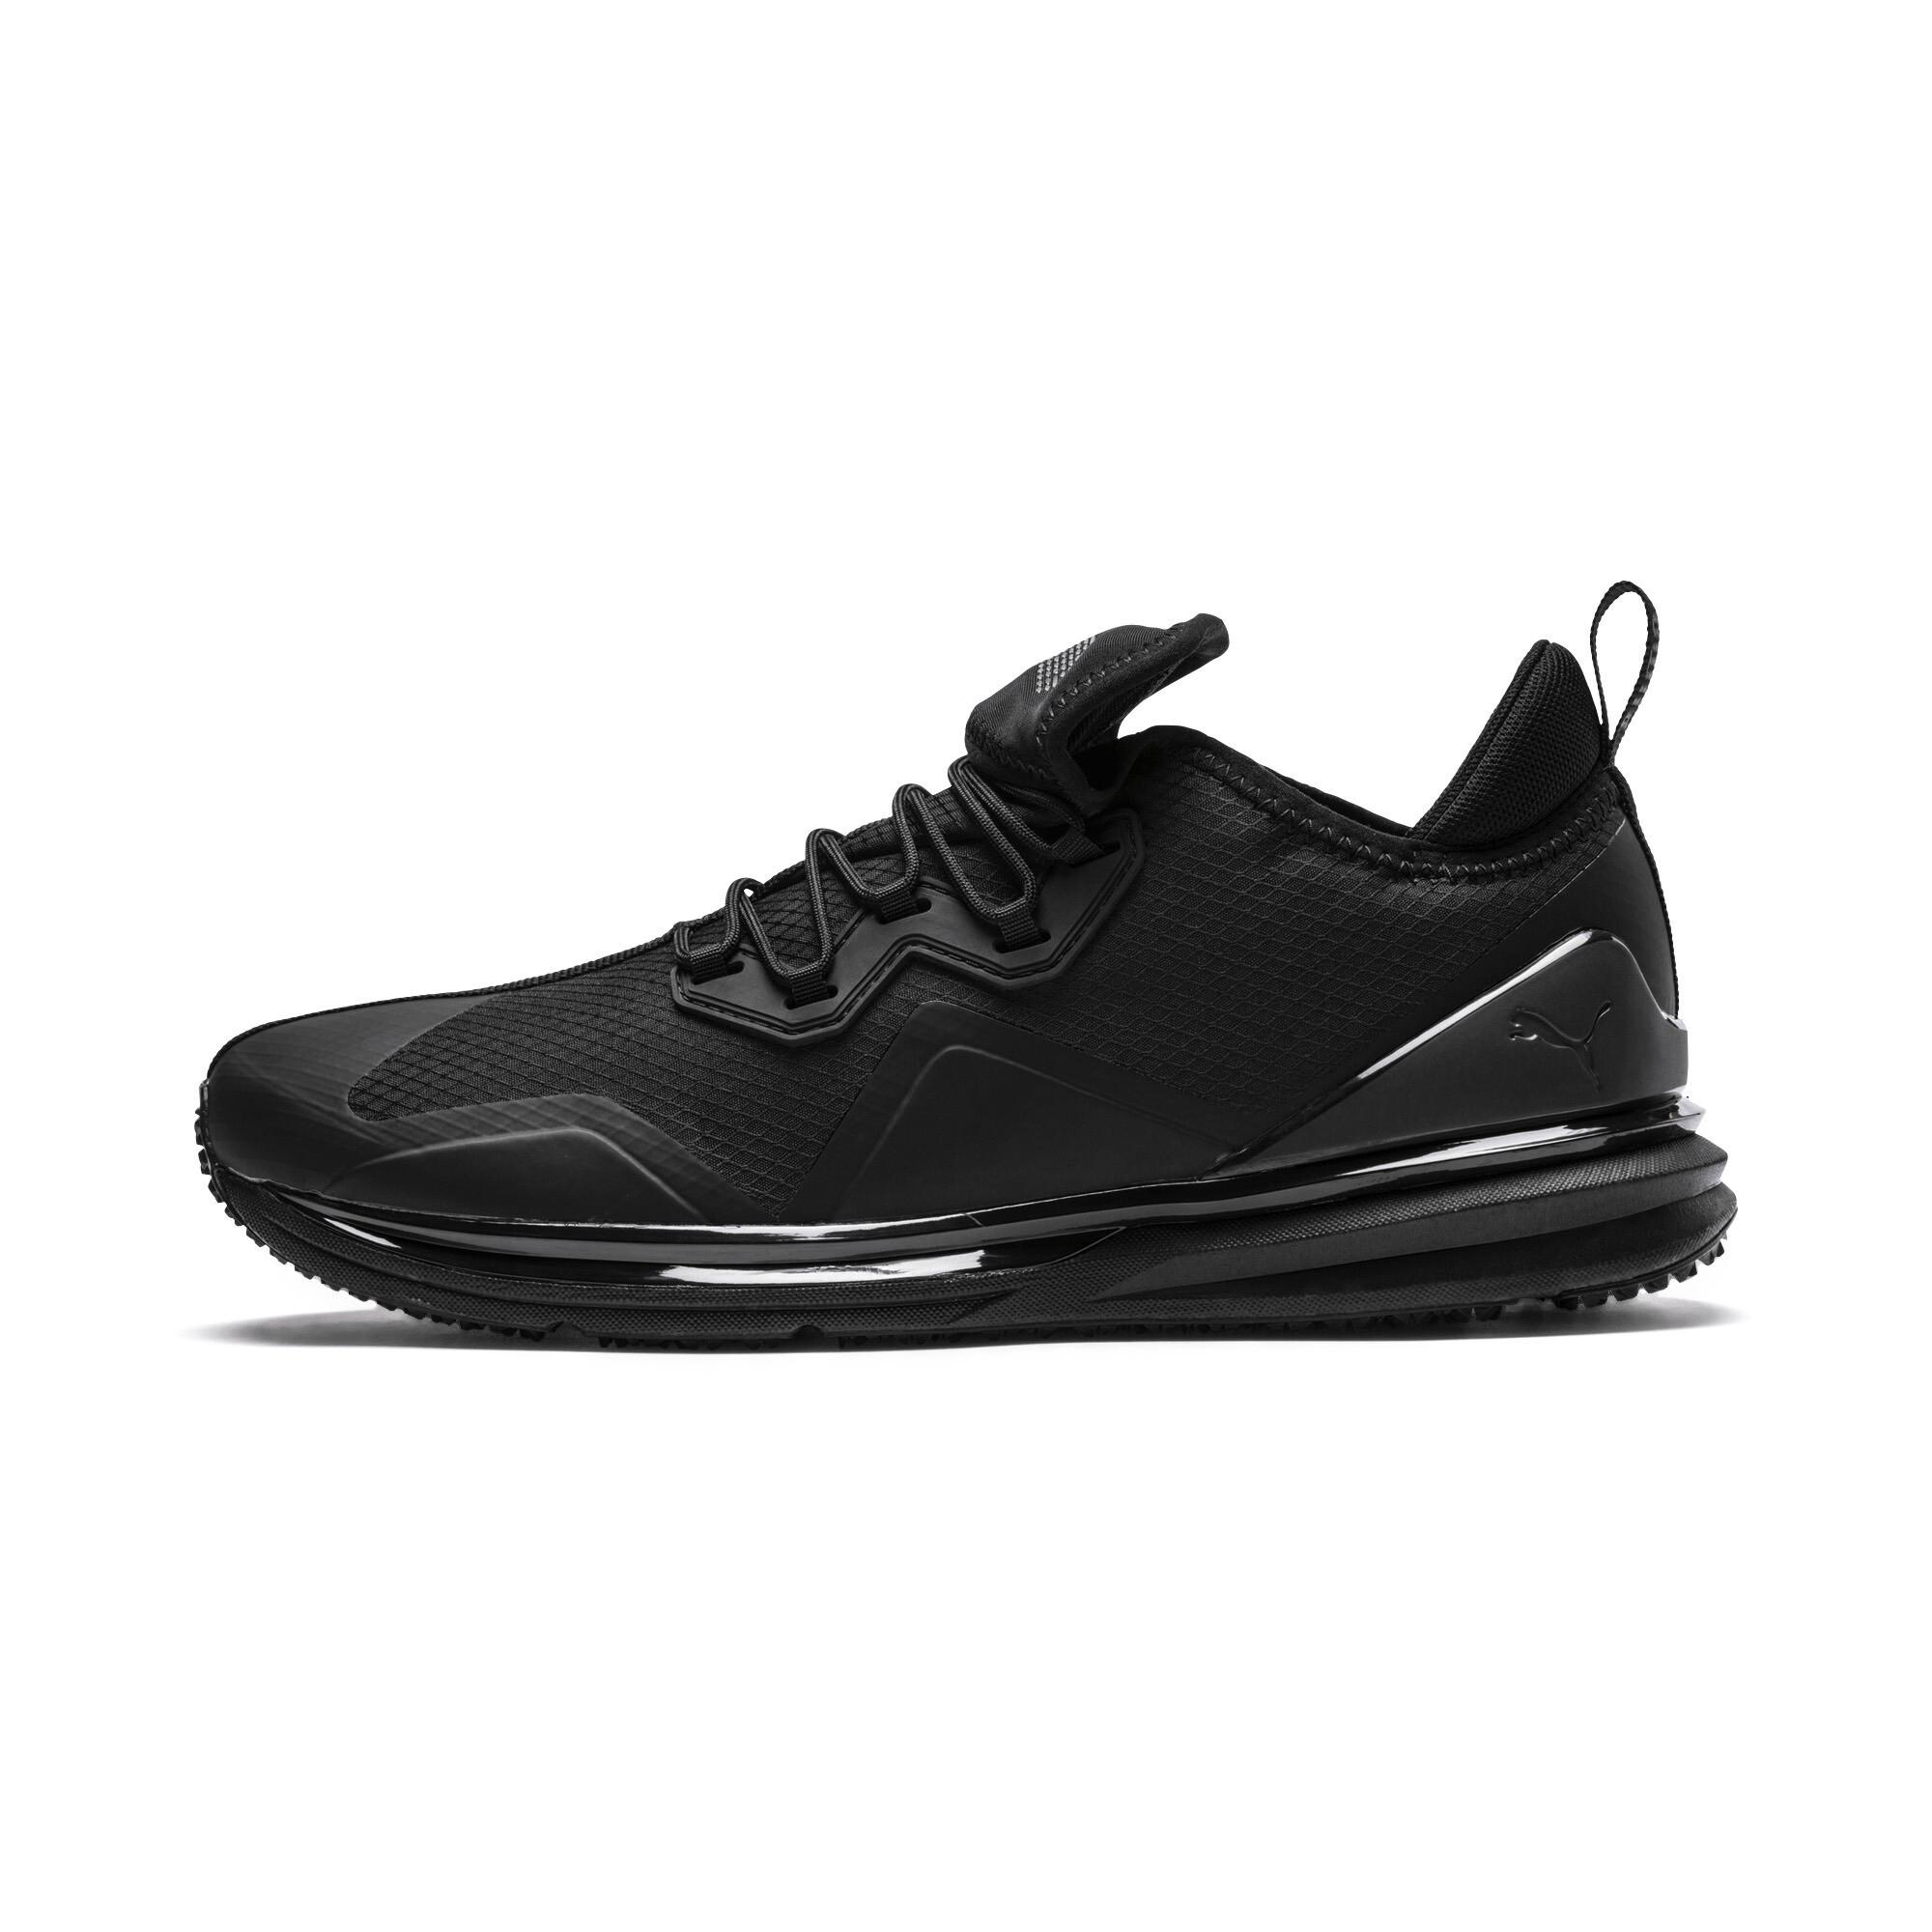 Image Puma IGNITE Limitless Initiate Men's Running Shoes #1